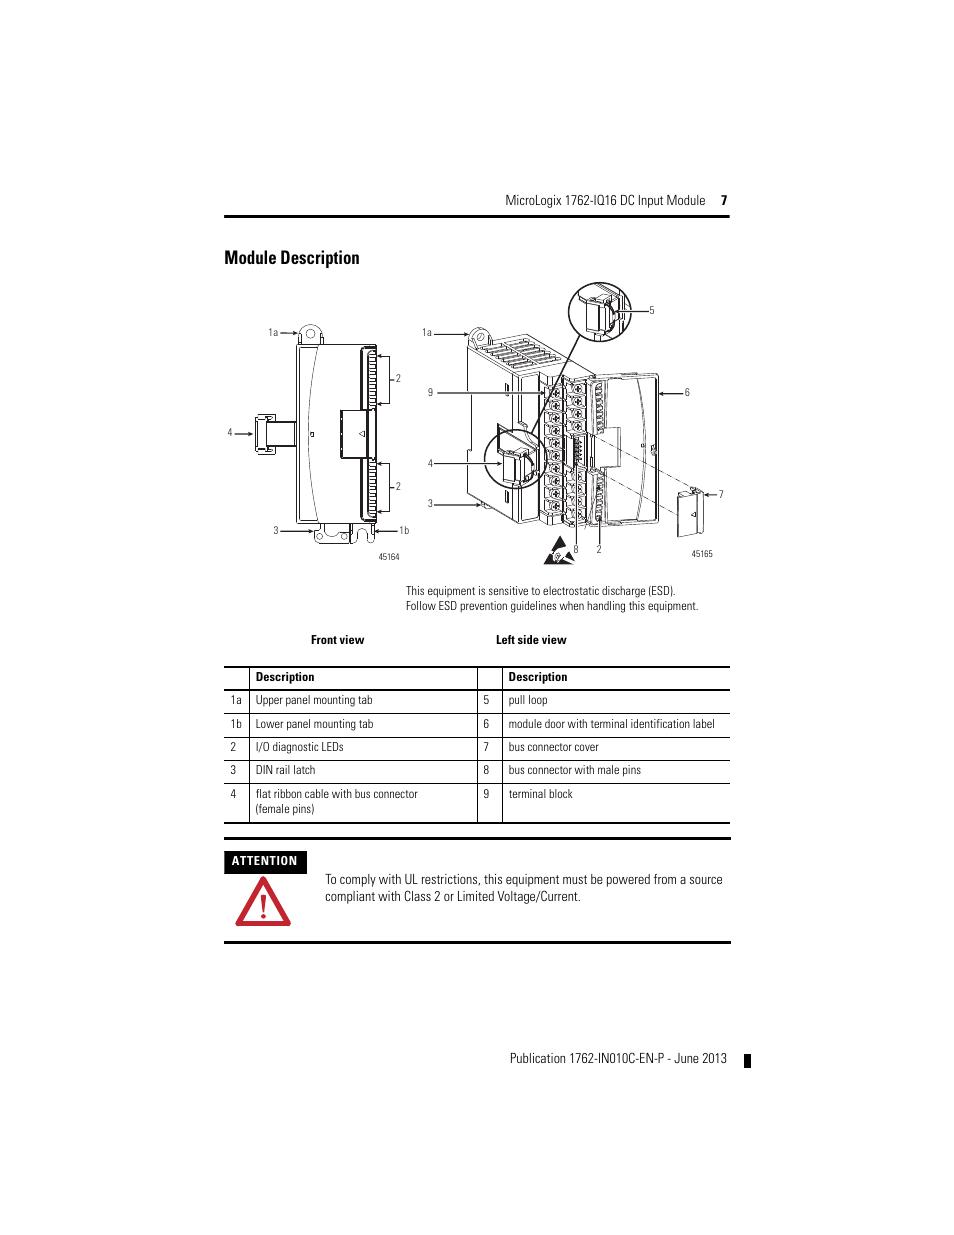 Module Description Rockwell Automation 1762 Iq16 Dc Input Module User Manual Page 7 20